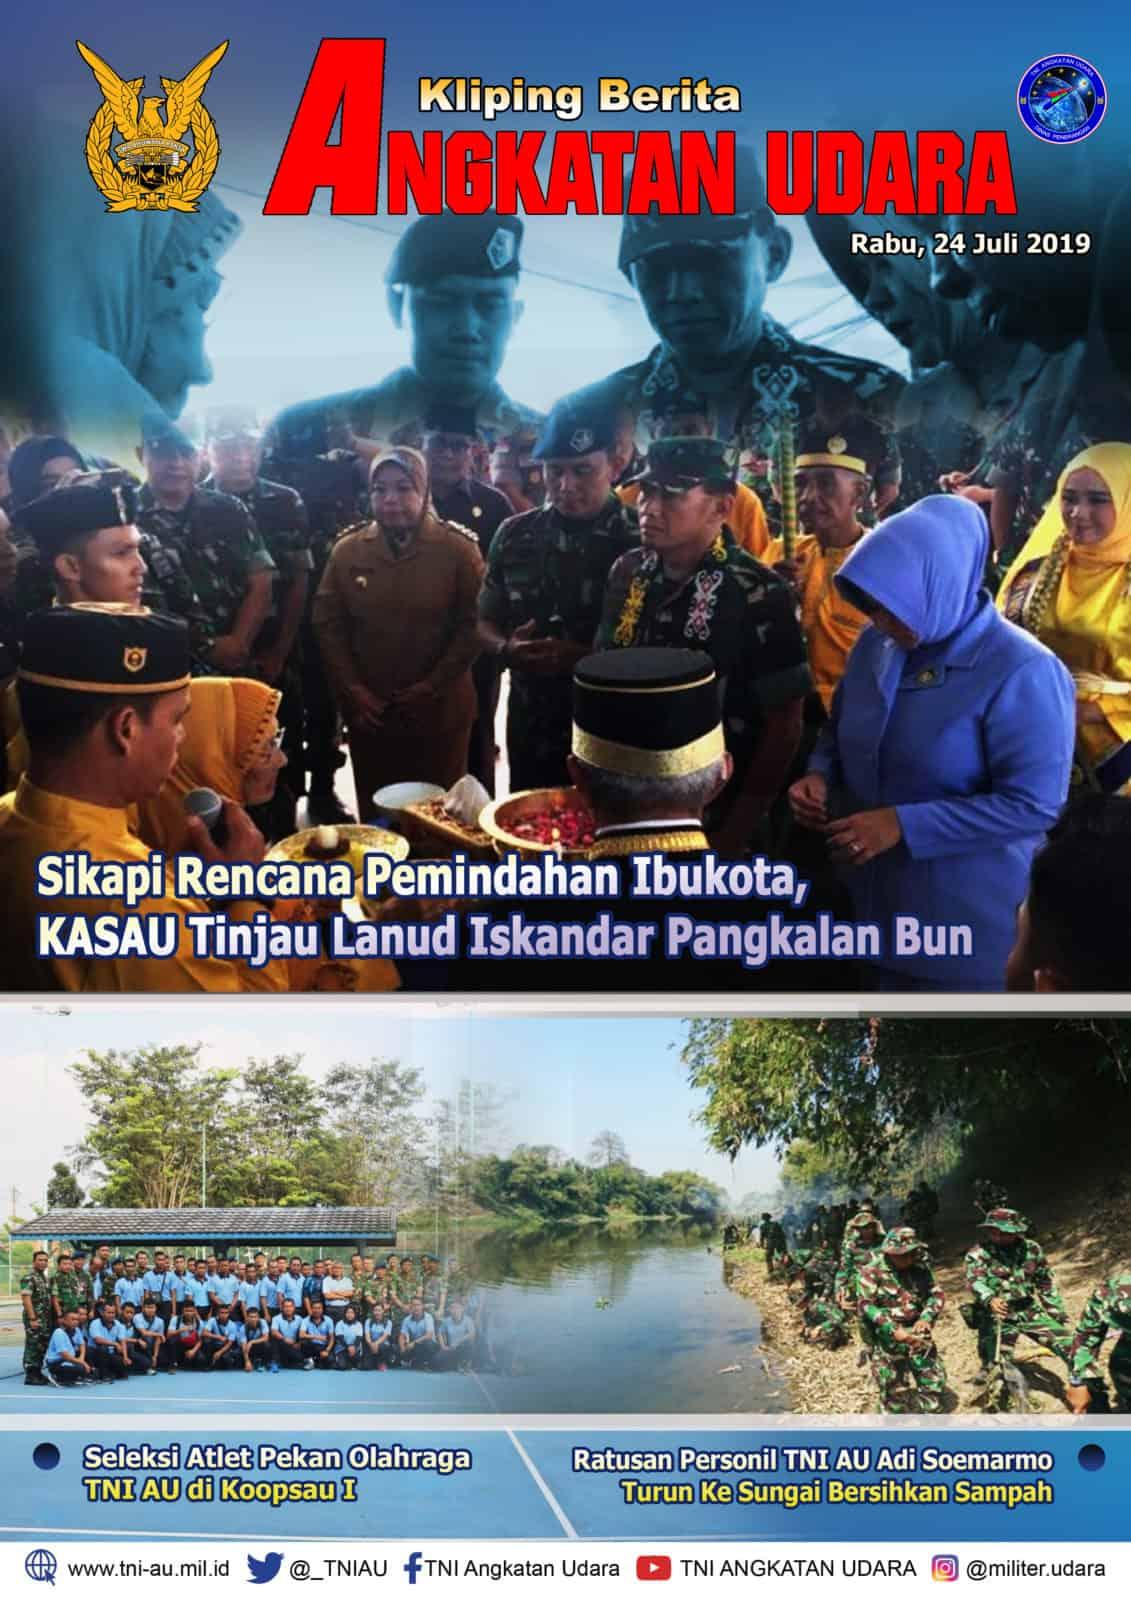 Kliping Berita Media 24 Juli 2019